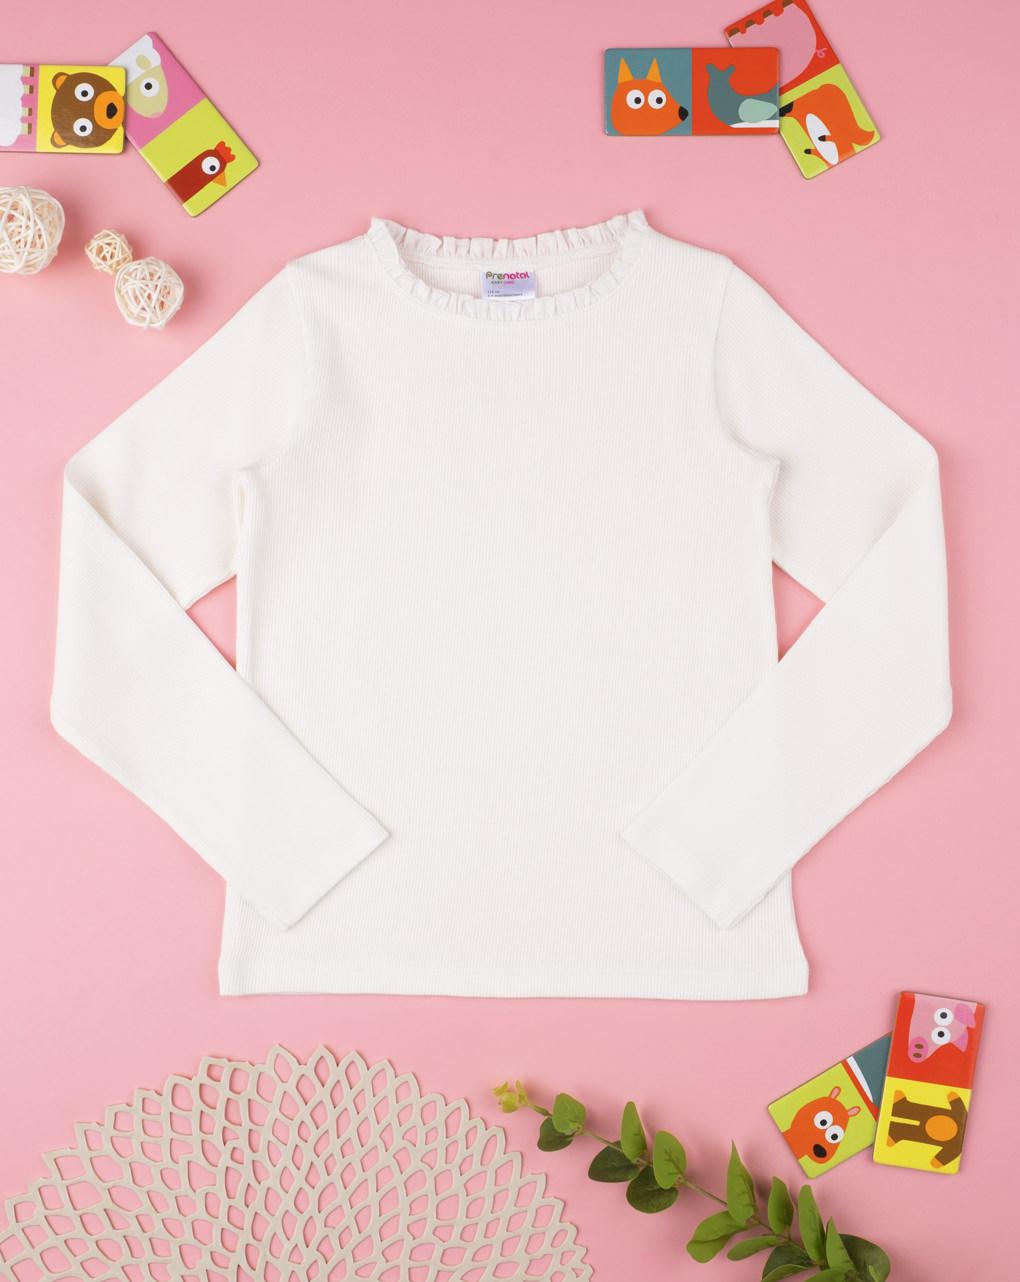 T-shirt costina girl white - Prénatal